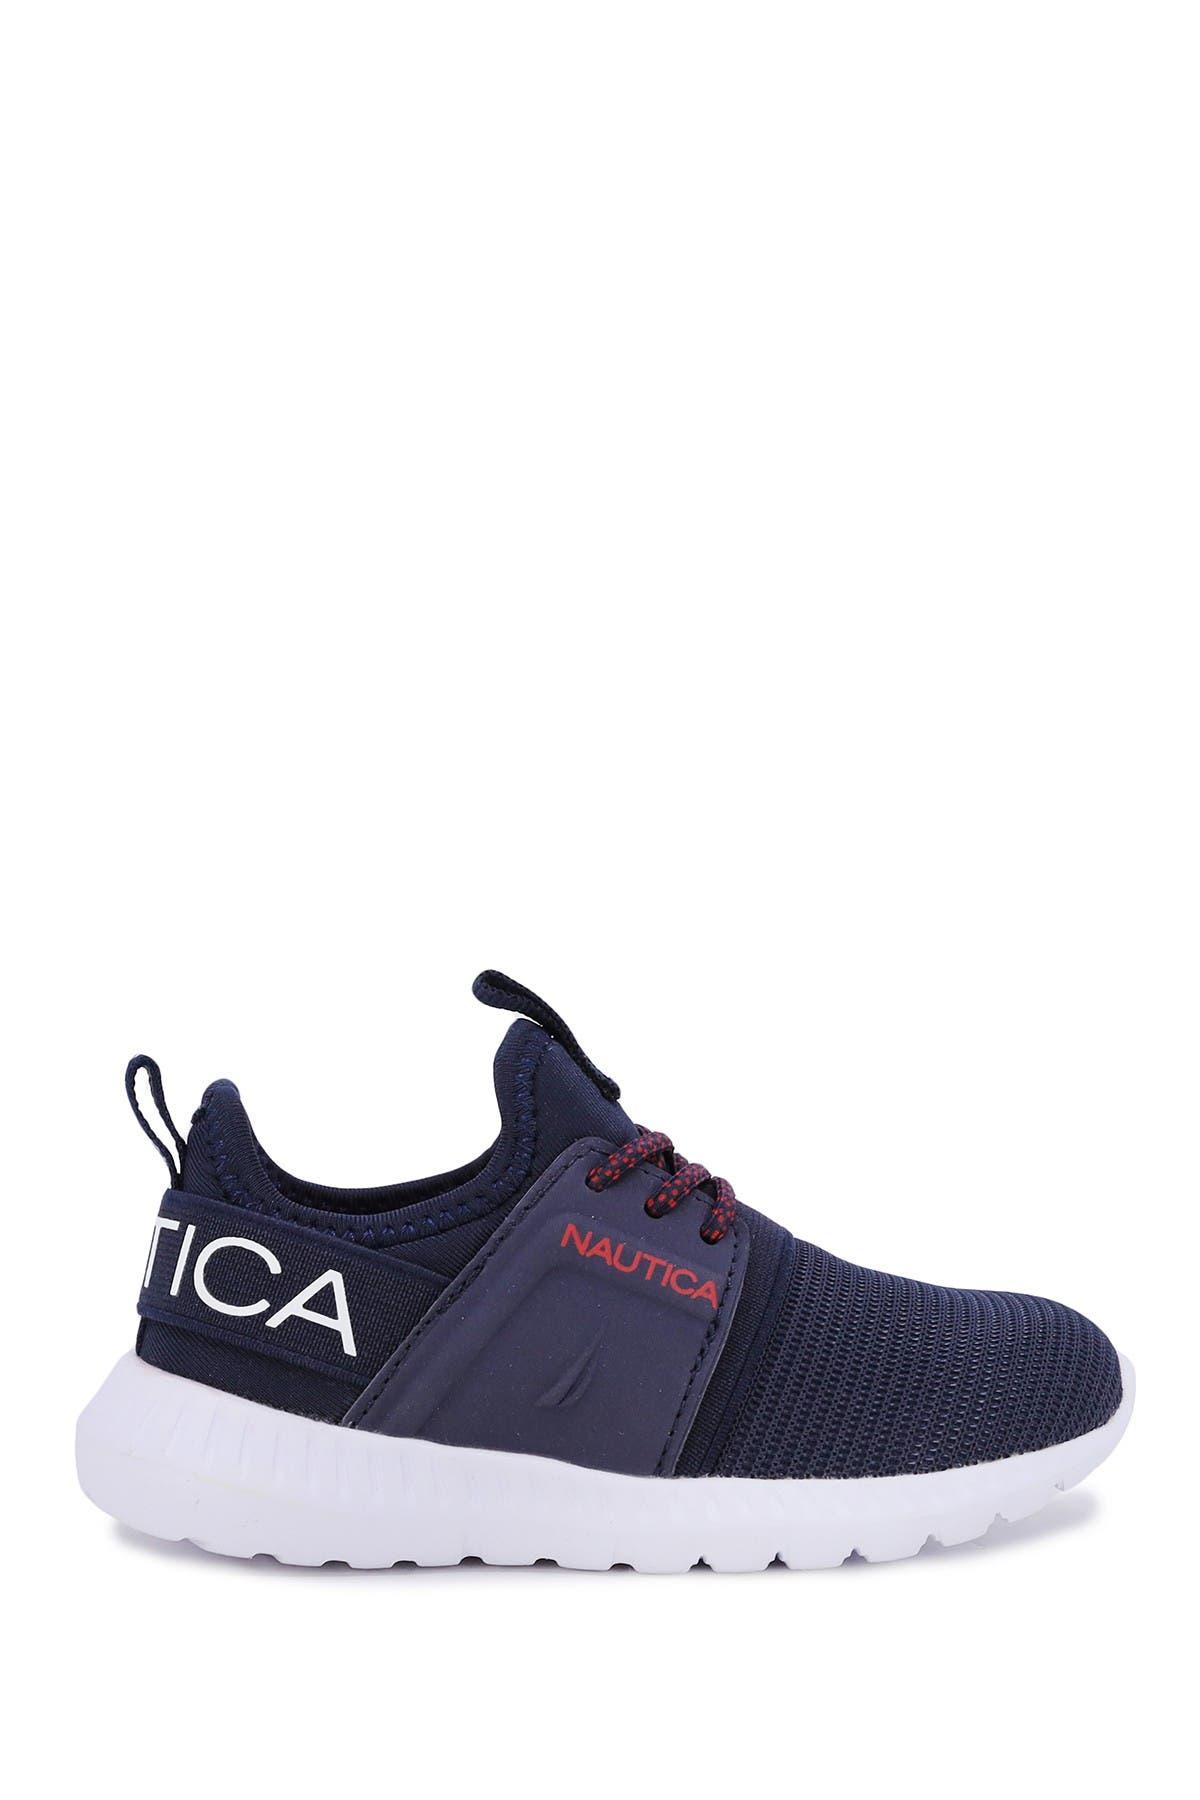 Image of Nautica Kappil Sneaker